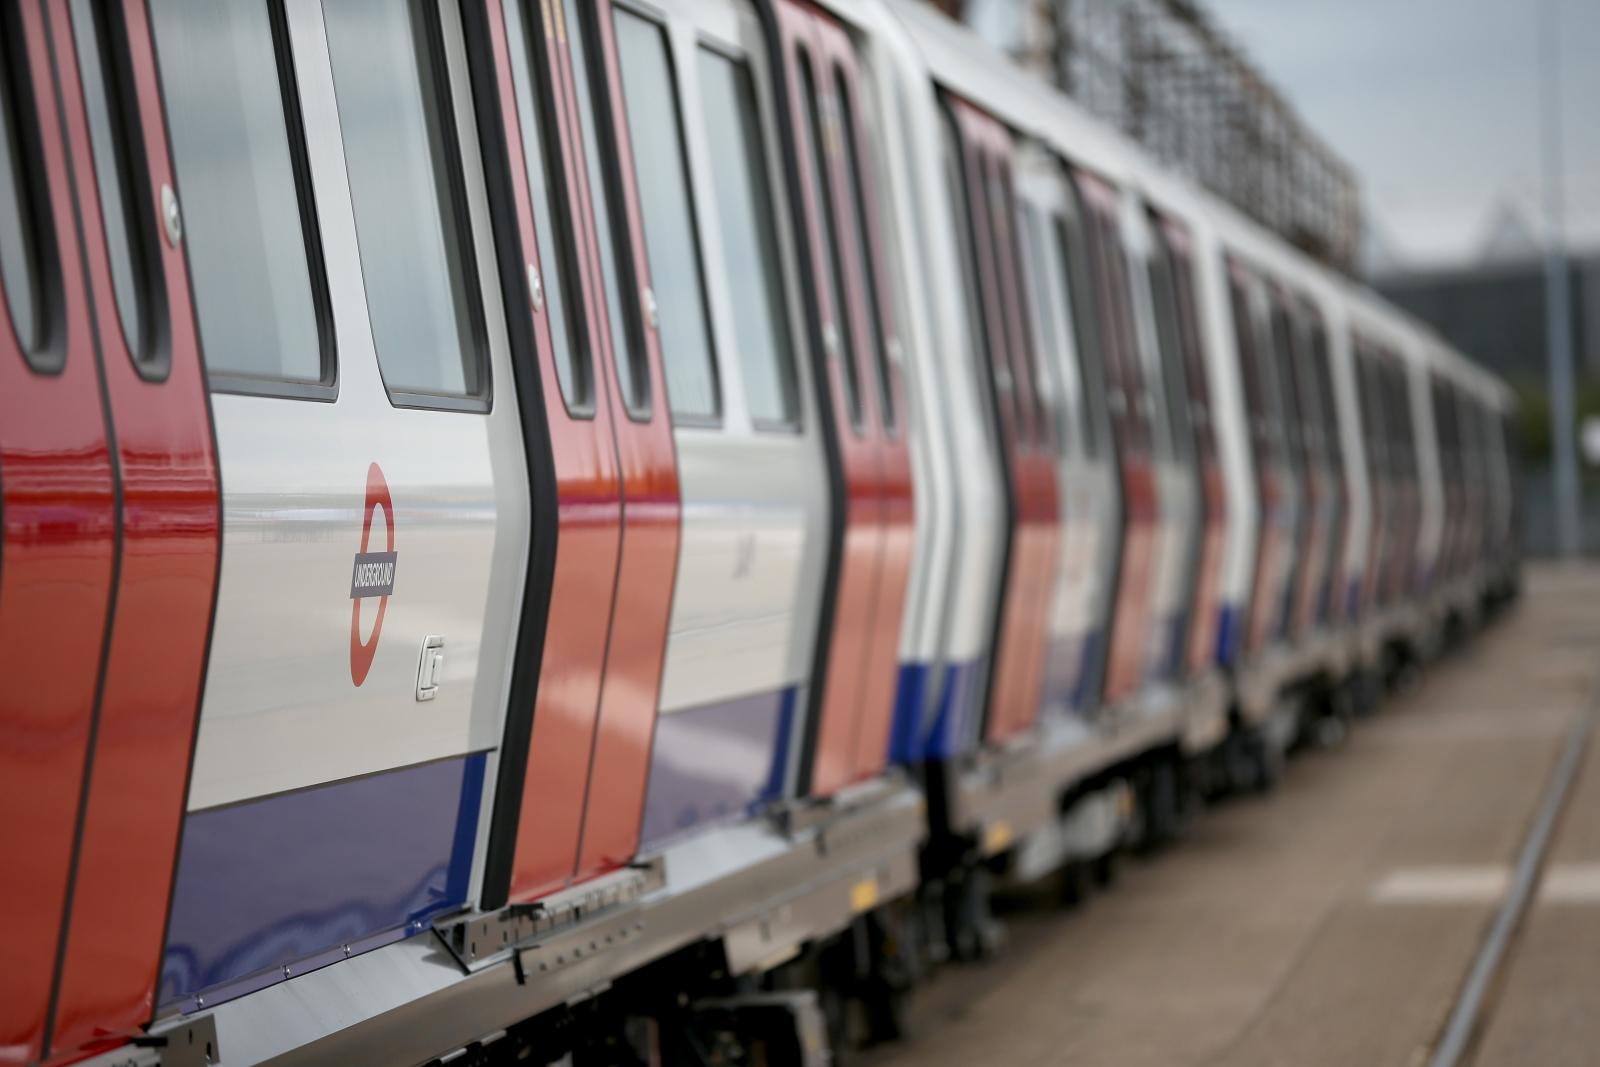 London Undergorunf Tube CarriagesBombardier Transport manufacturing plant